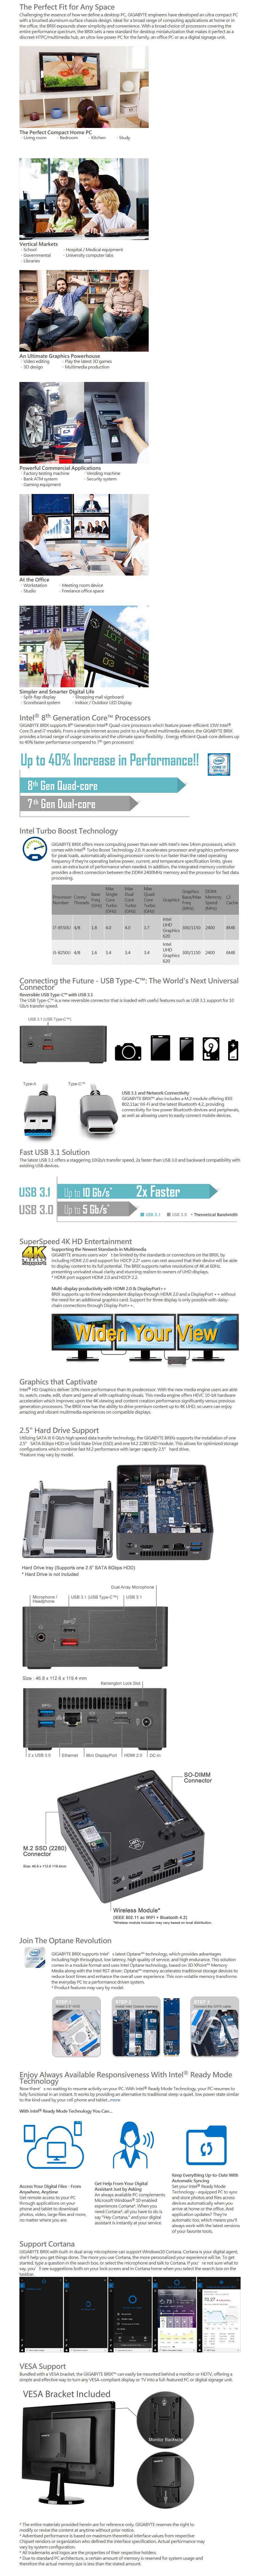 Gigabyte Brix GB-BRi7H-8550 Barebone Kit - Intel i5 8th Gen Processor - Desktop Overview 1